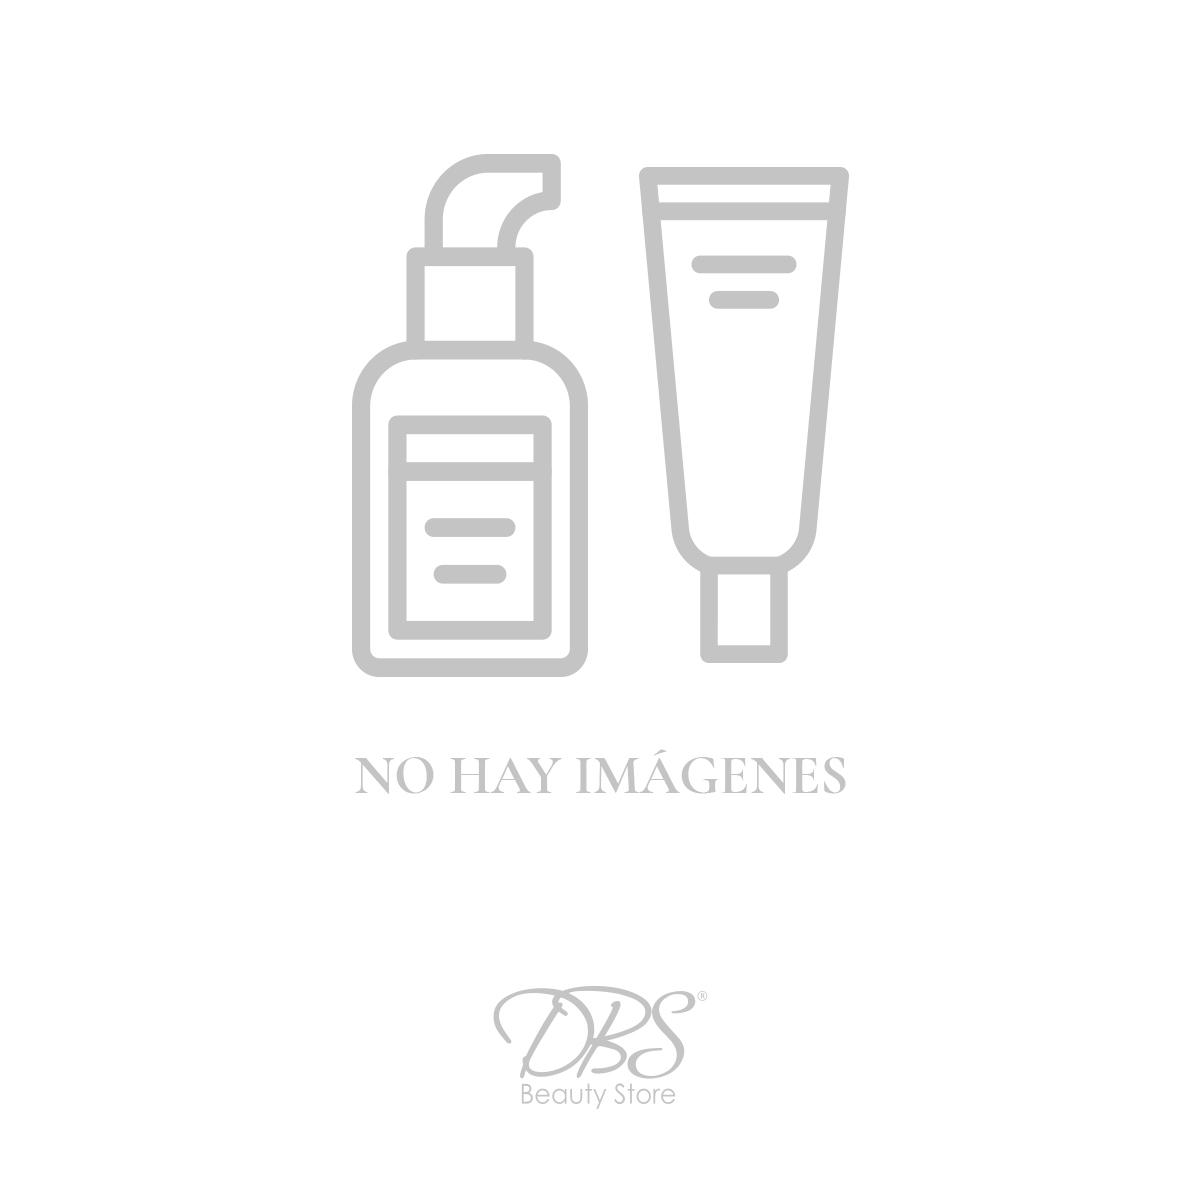 loreal-maquillaje-LO-49900.jpg